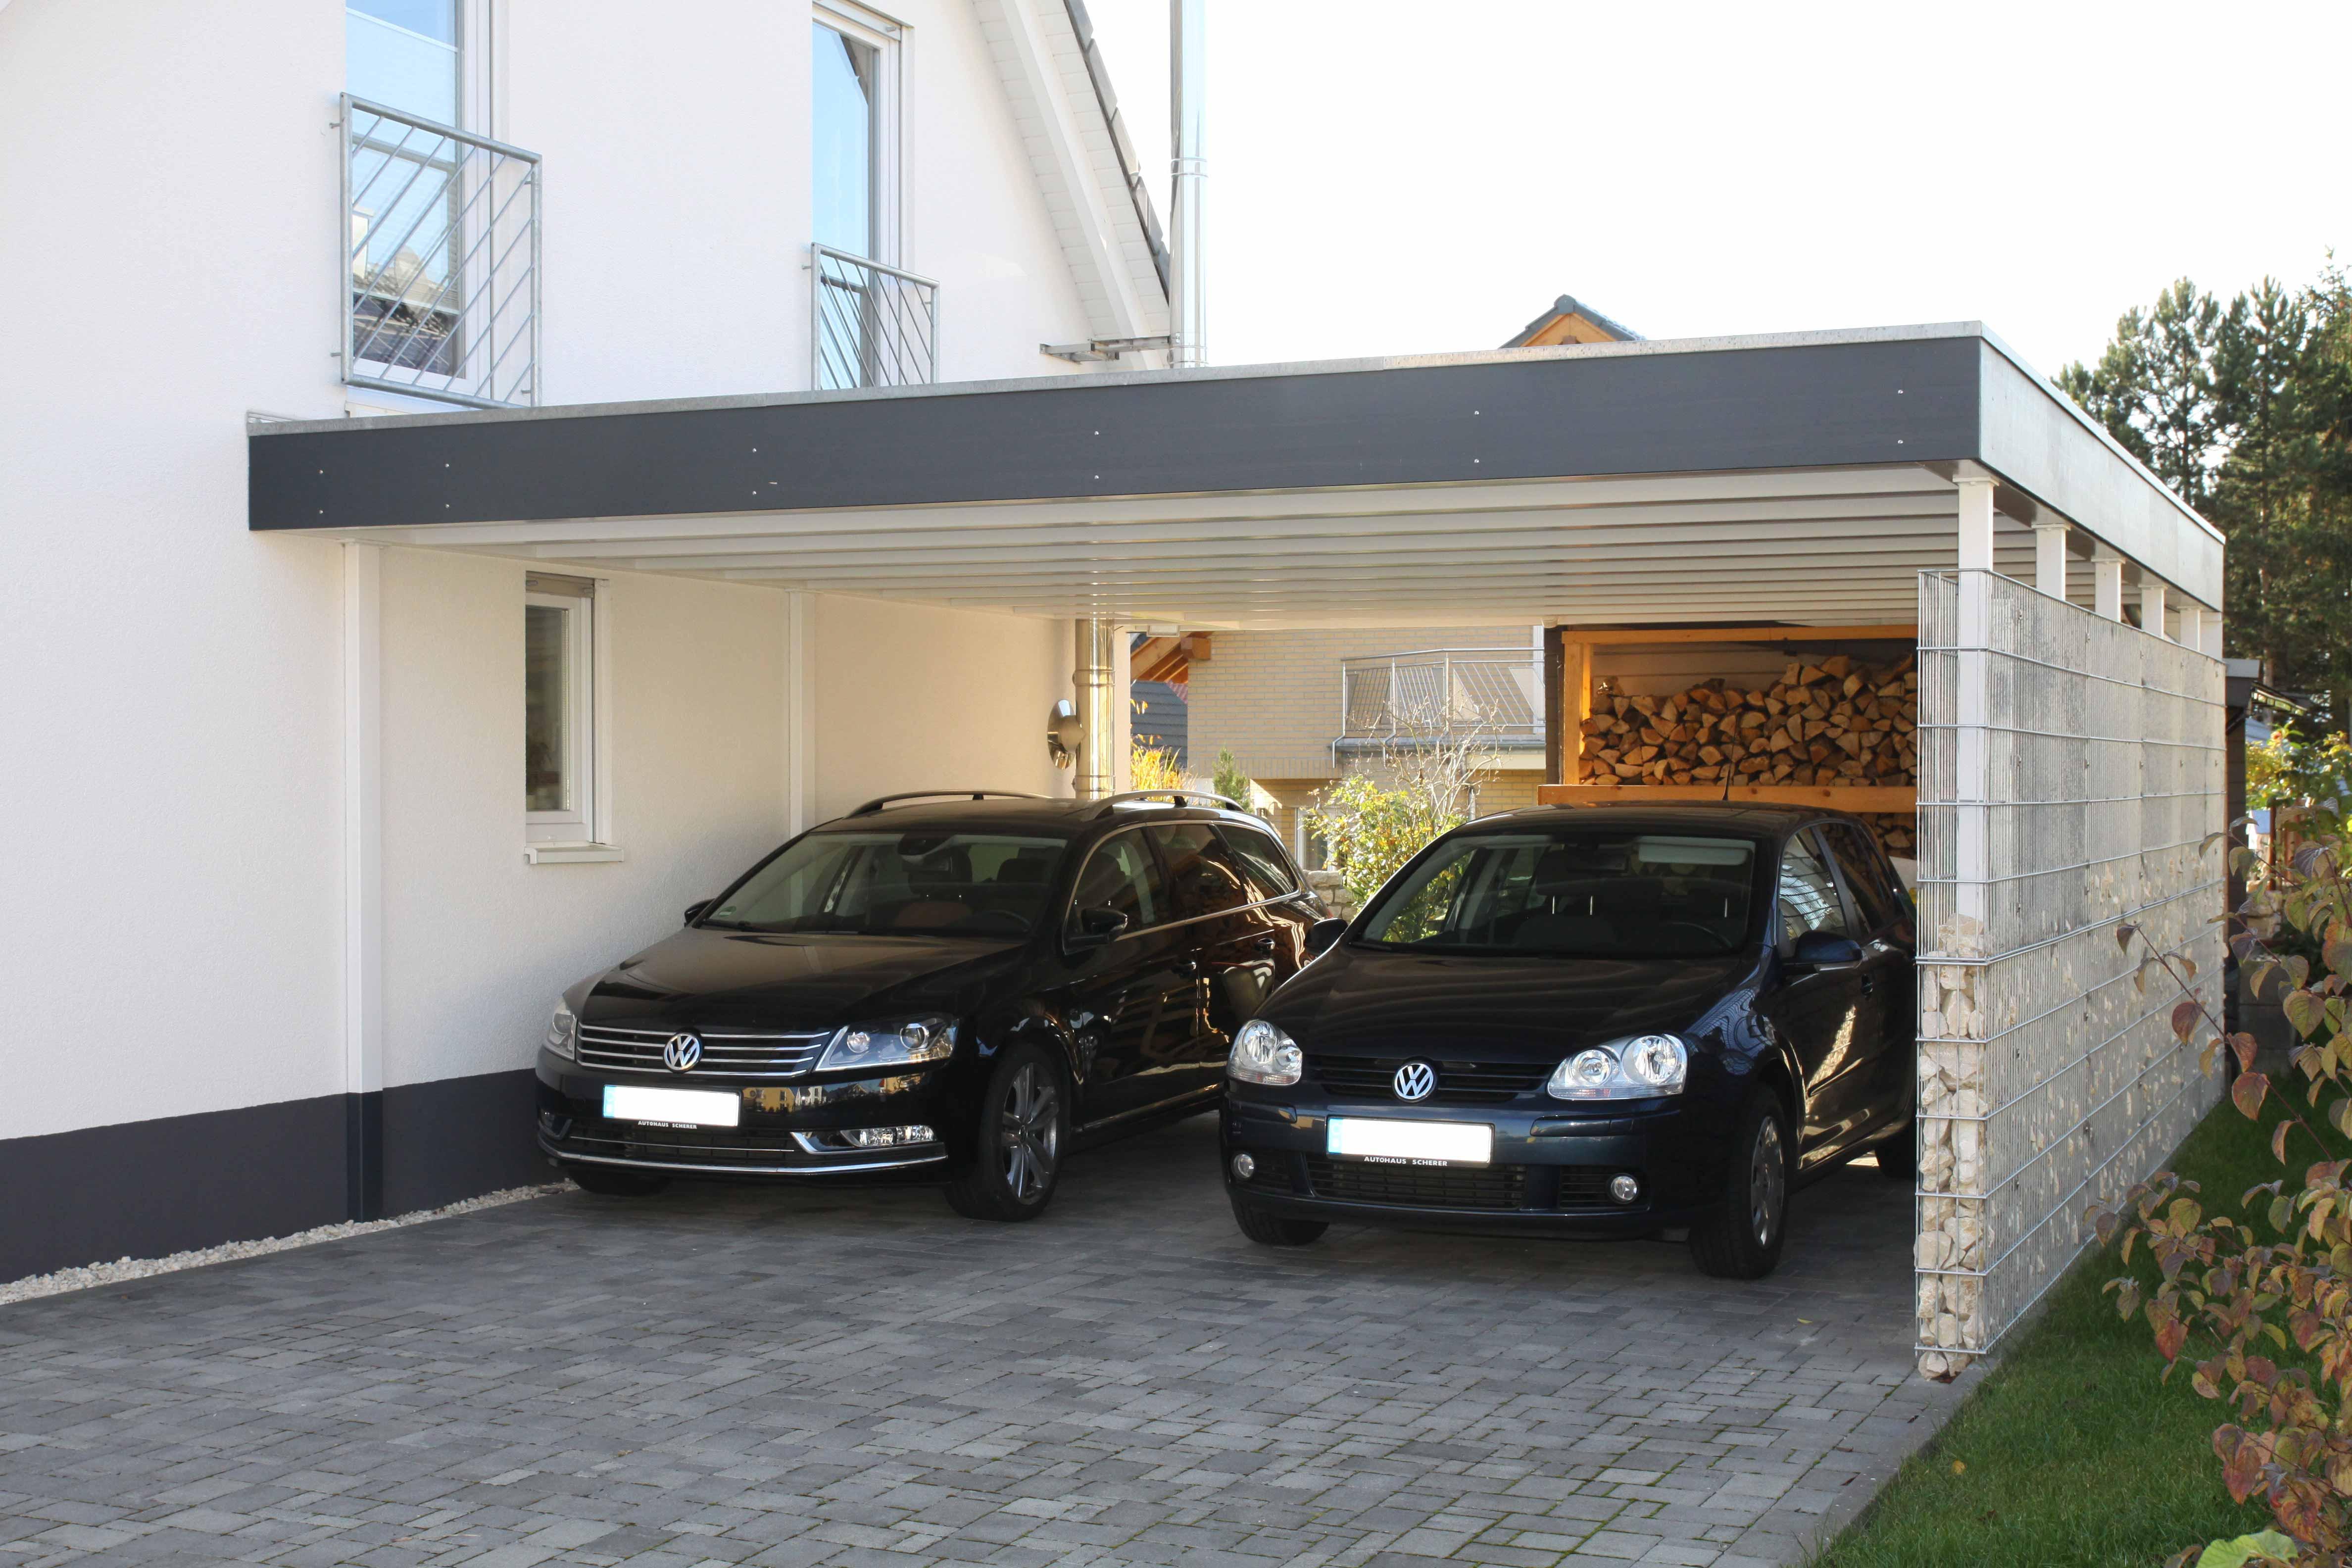 carport am haus affordable walmdach carport am haus carportwerk gmbh garage pinterest haus. Black Bedroom Furniture Sets. Home Design Ideas